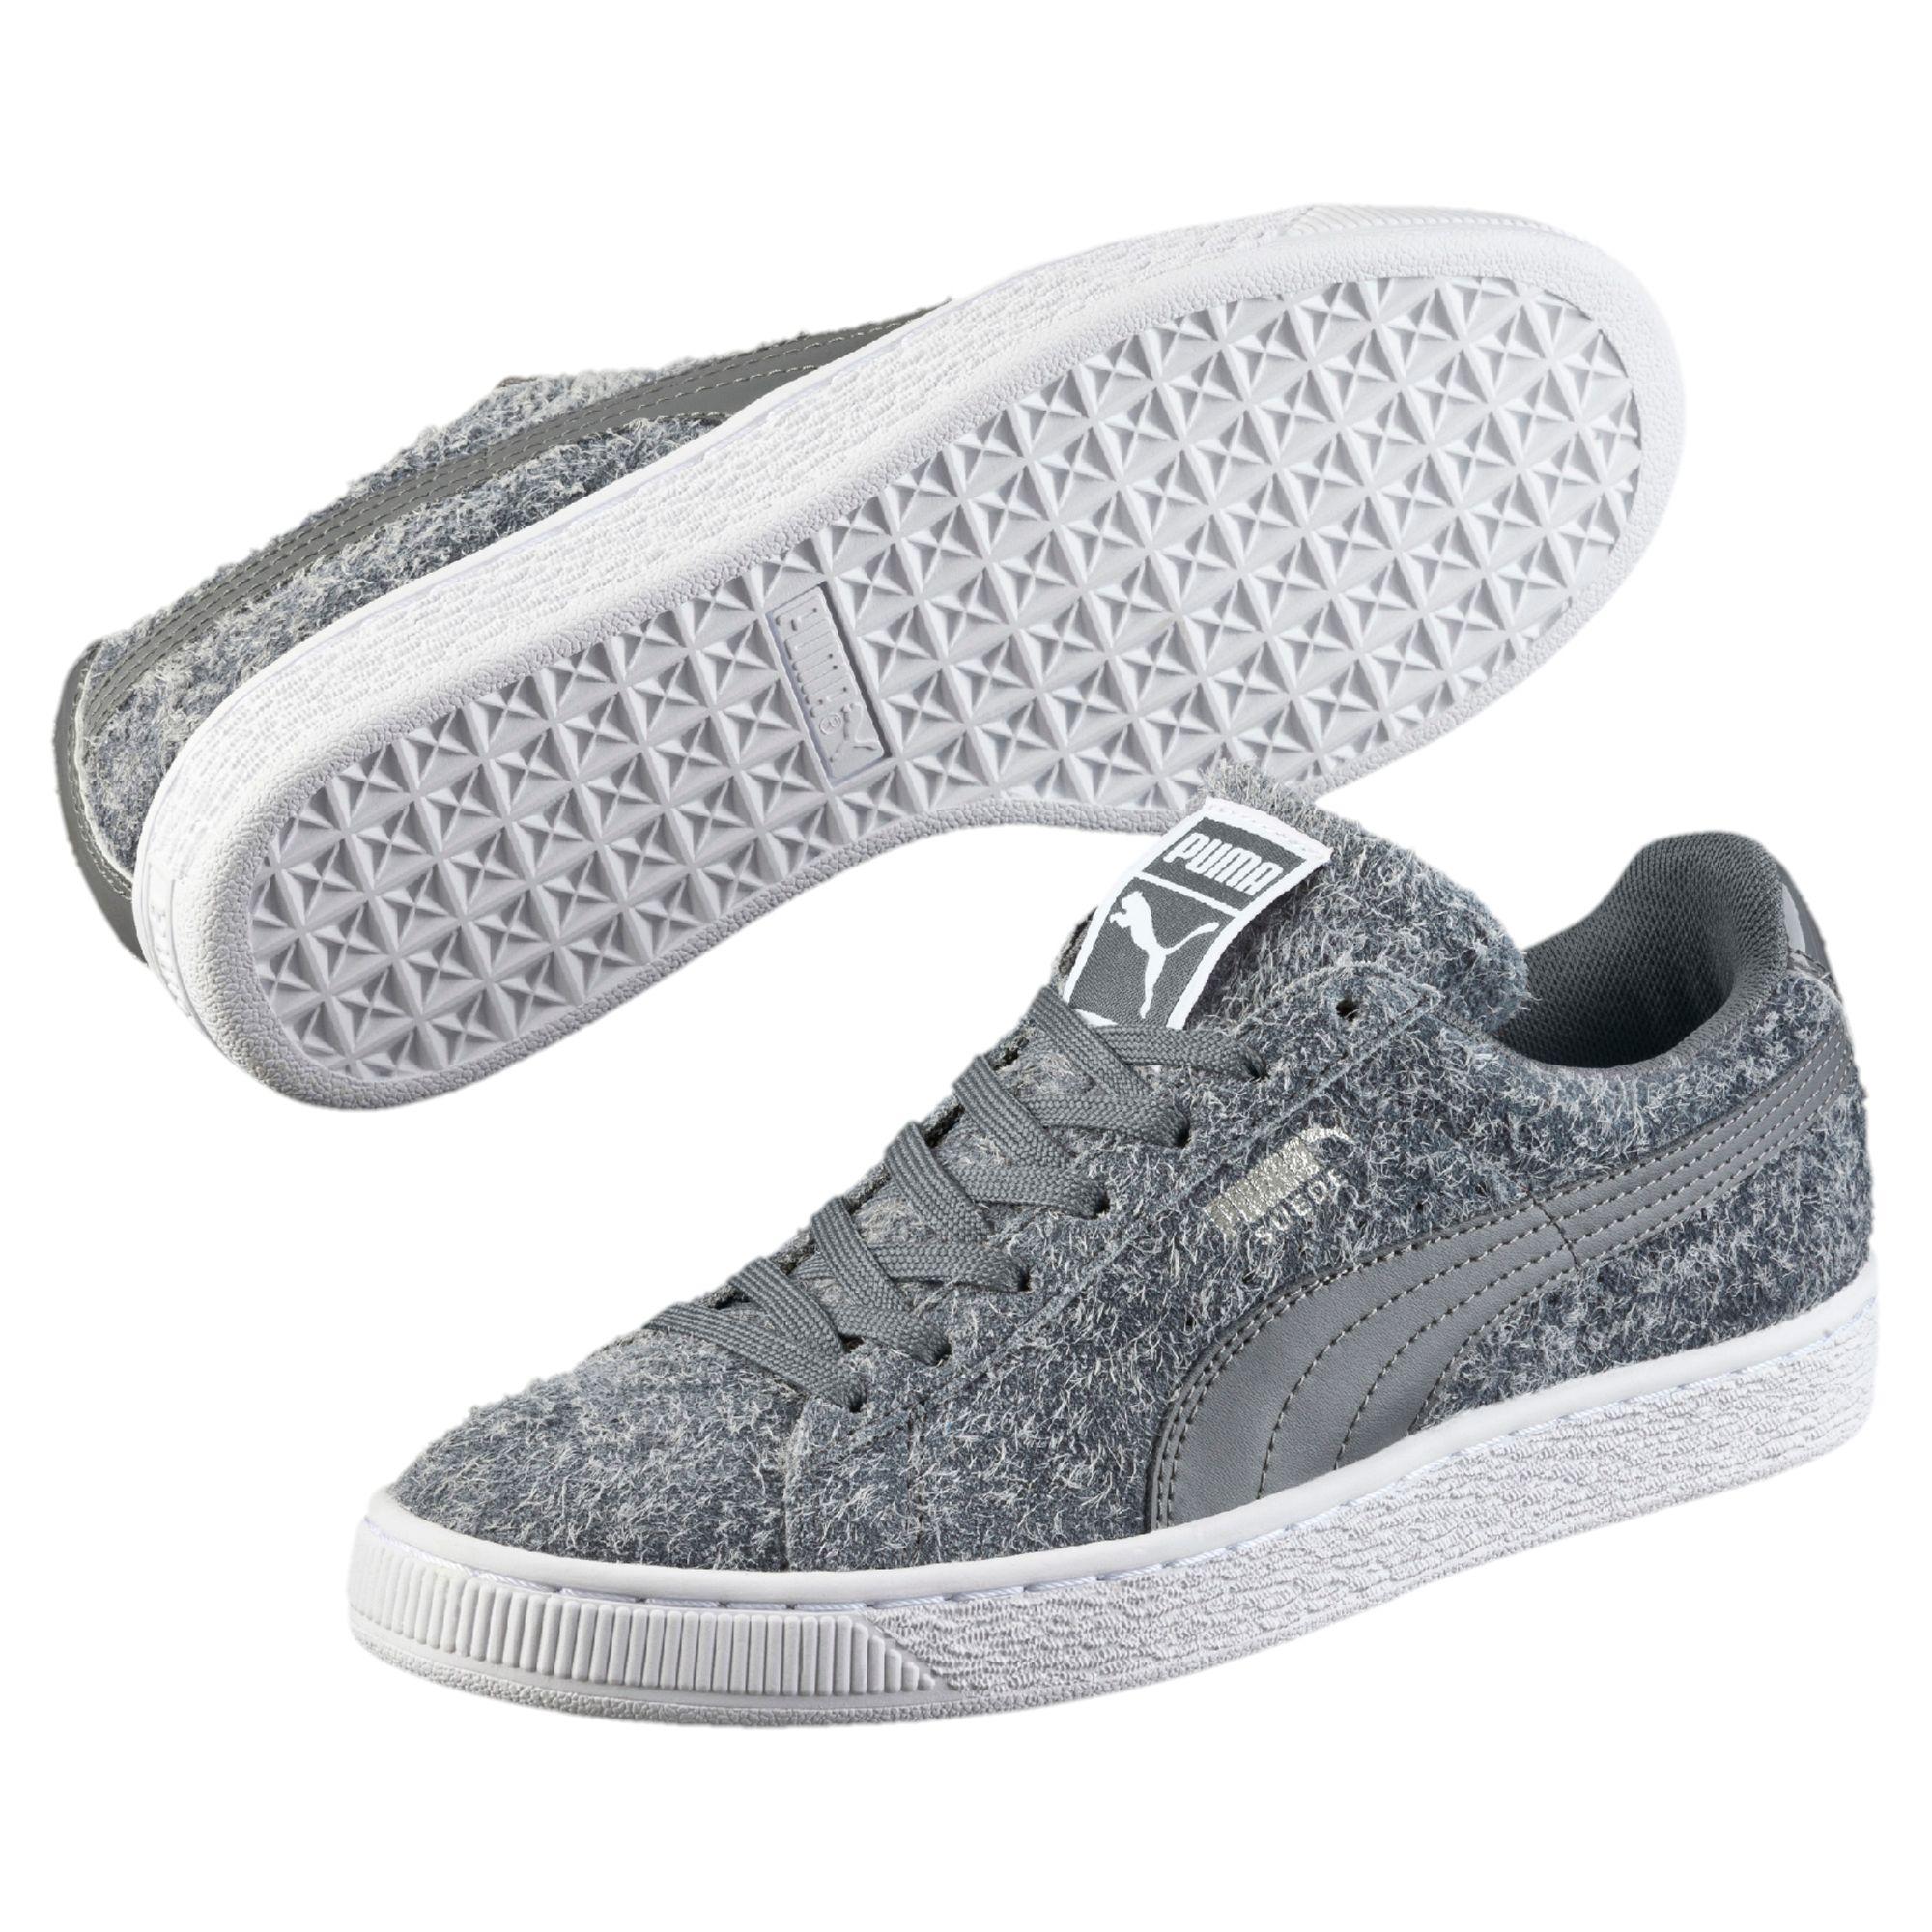 puma suede elemental damen sneaker sport classics schuhe frauen neu ebay. Black Bedroom Furniture Sets. Home Design Ideas